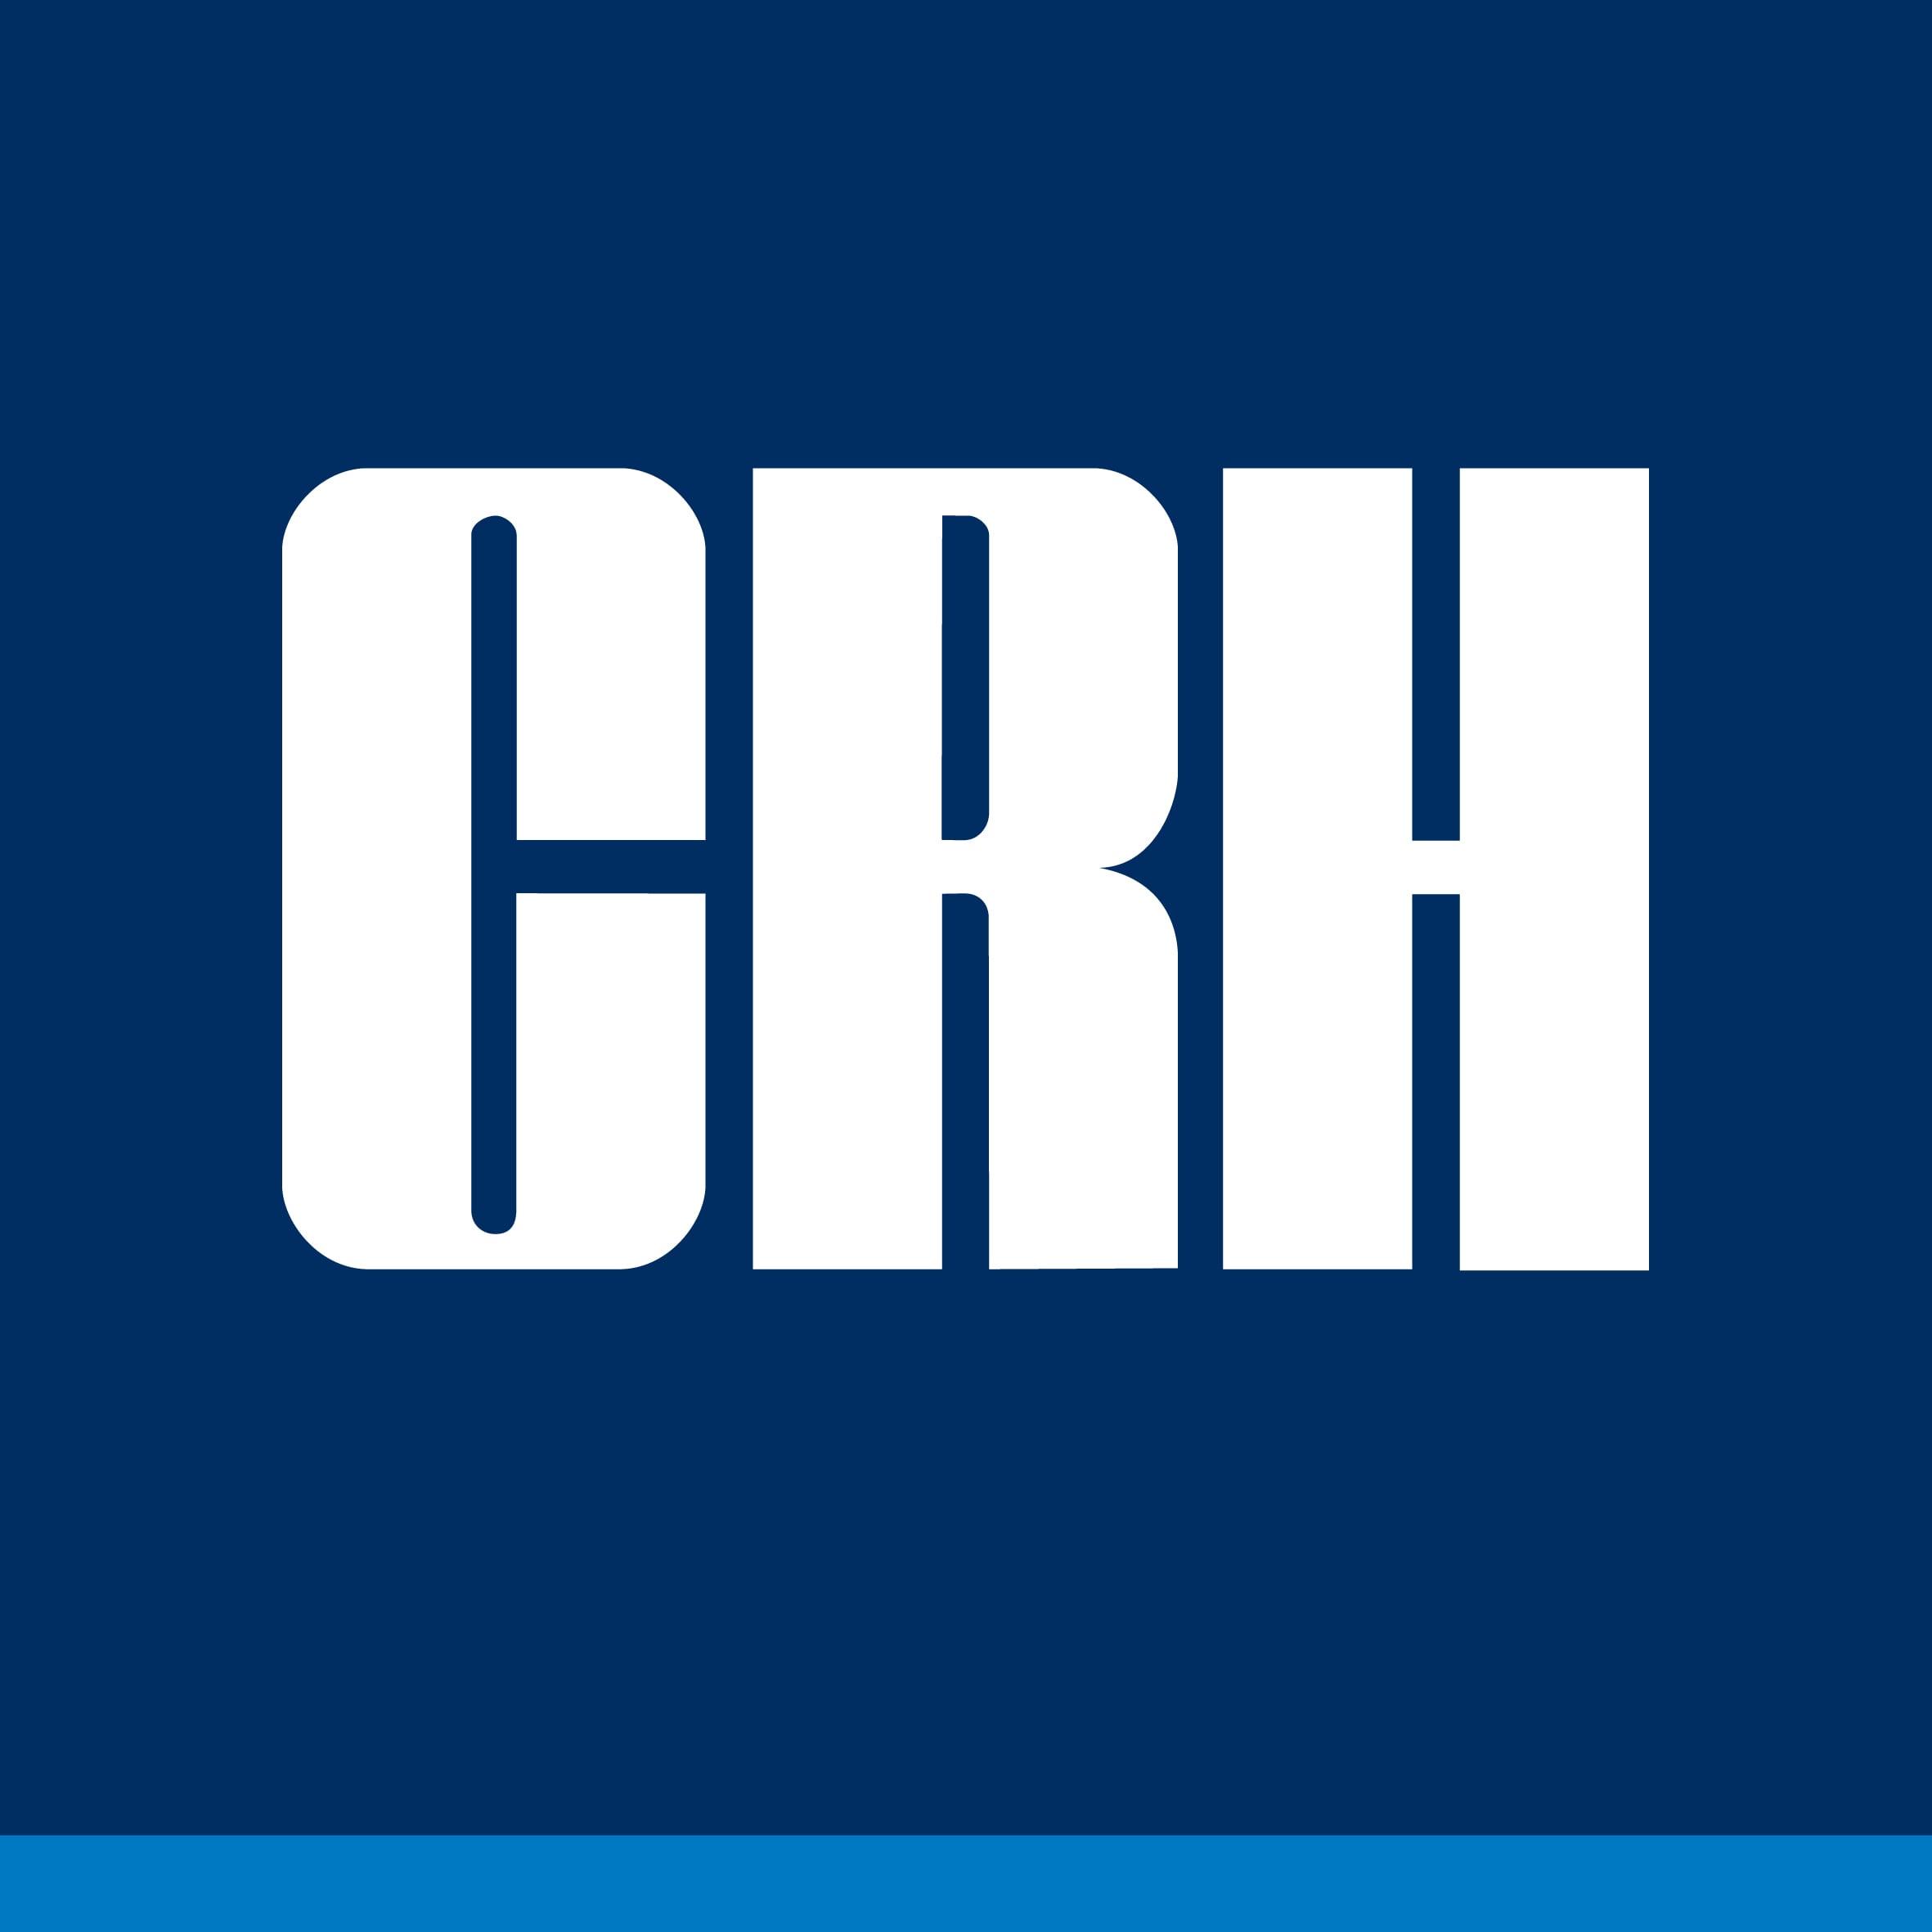 CRH_logo